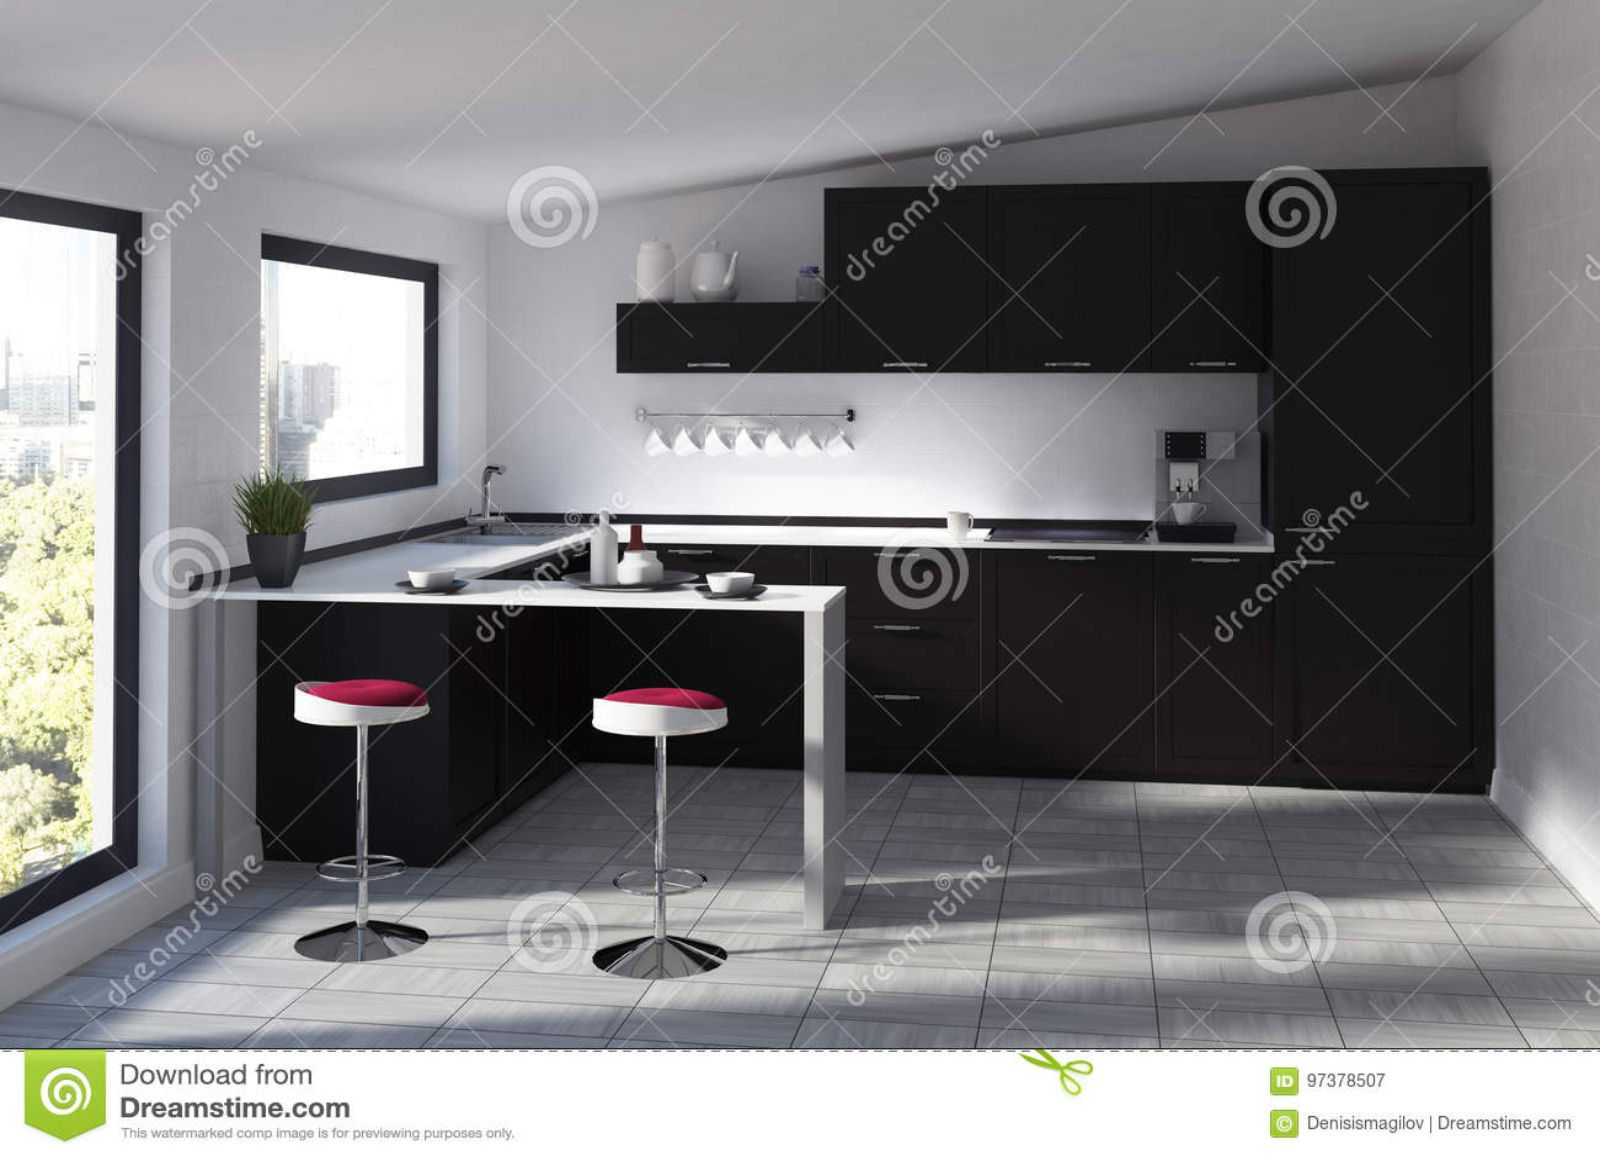 Cuisine Futuriste Avec Une Barre Noire Illustration Stock